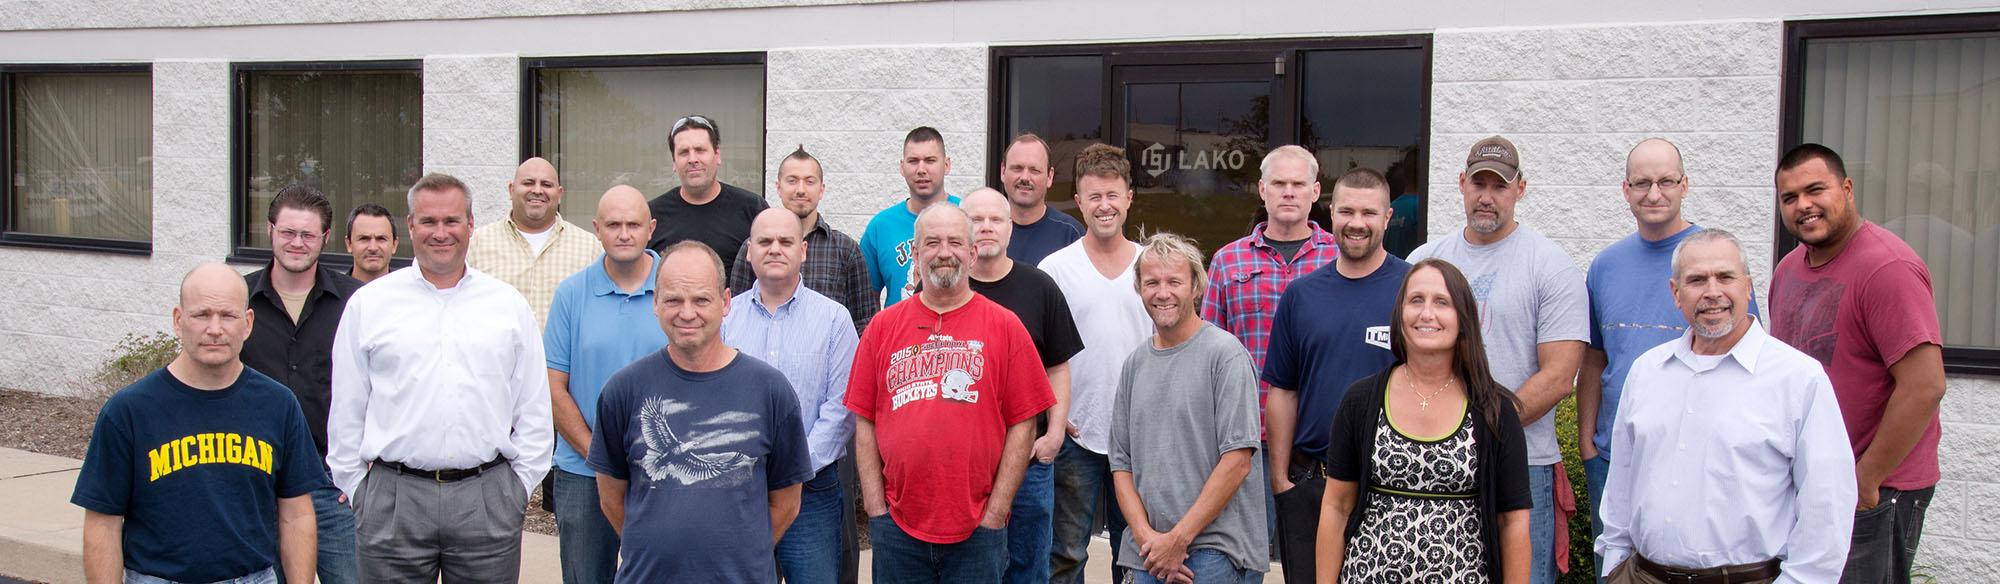 Lako Tool Employee Group Picture